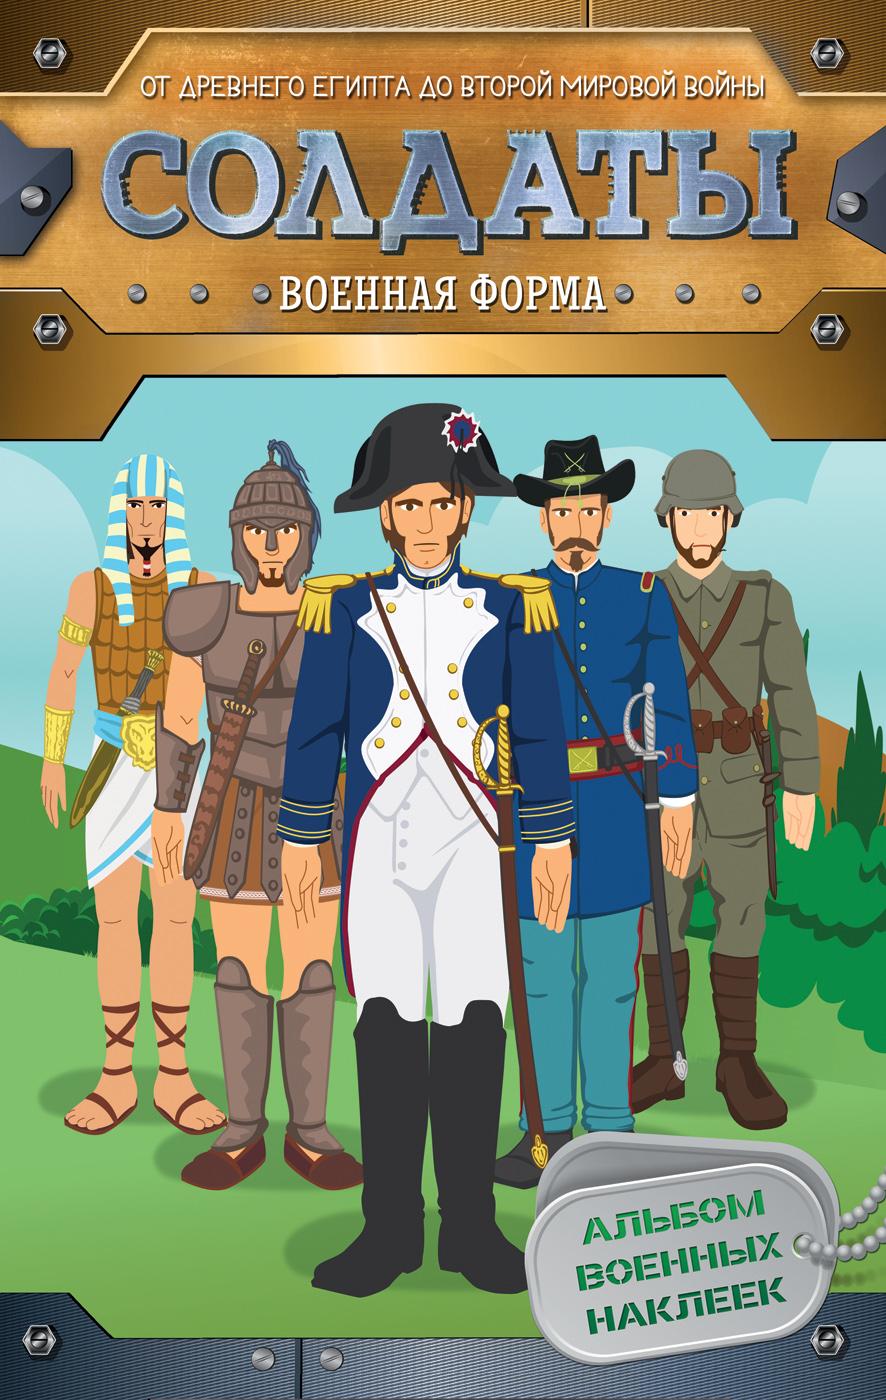 Мазанова Е. К. Солдаты. Военная форма (+ наклейки)